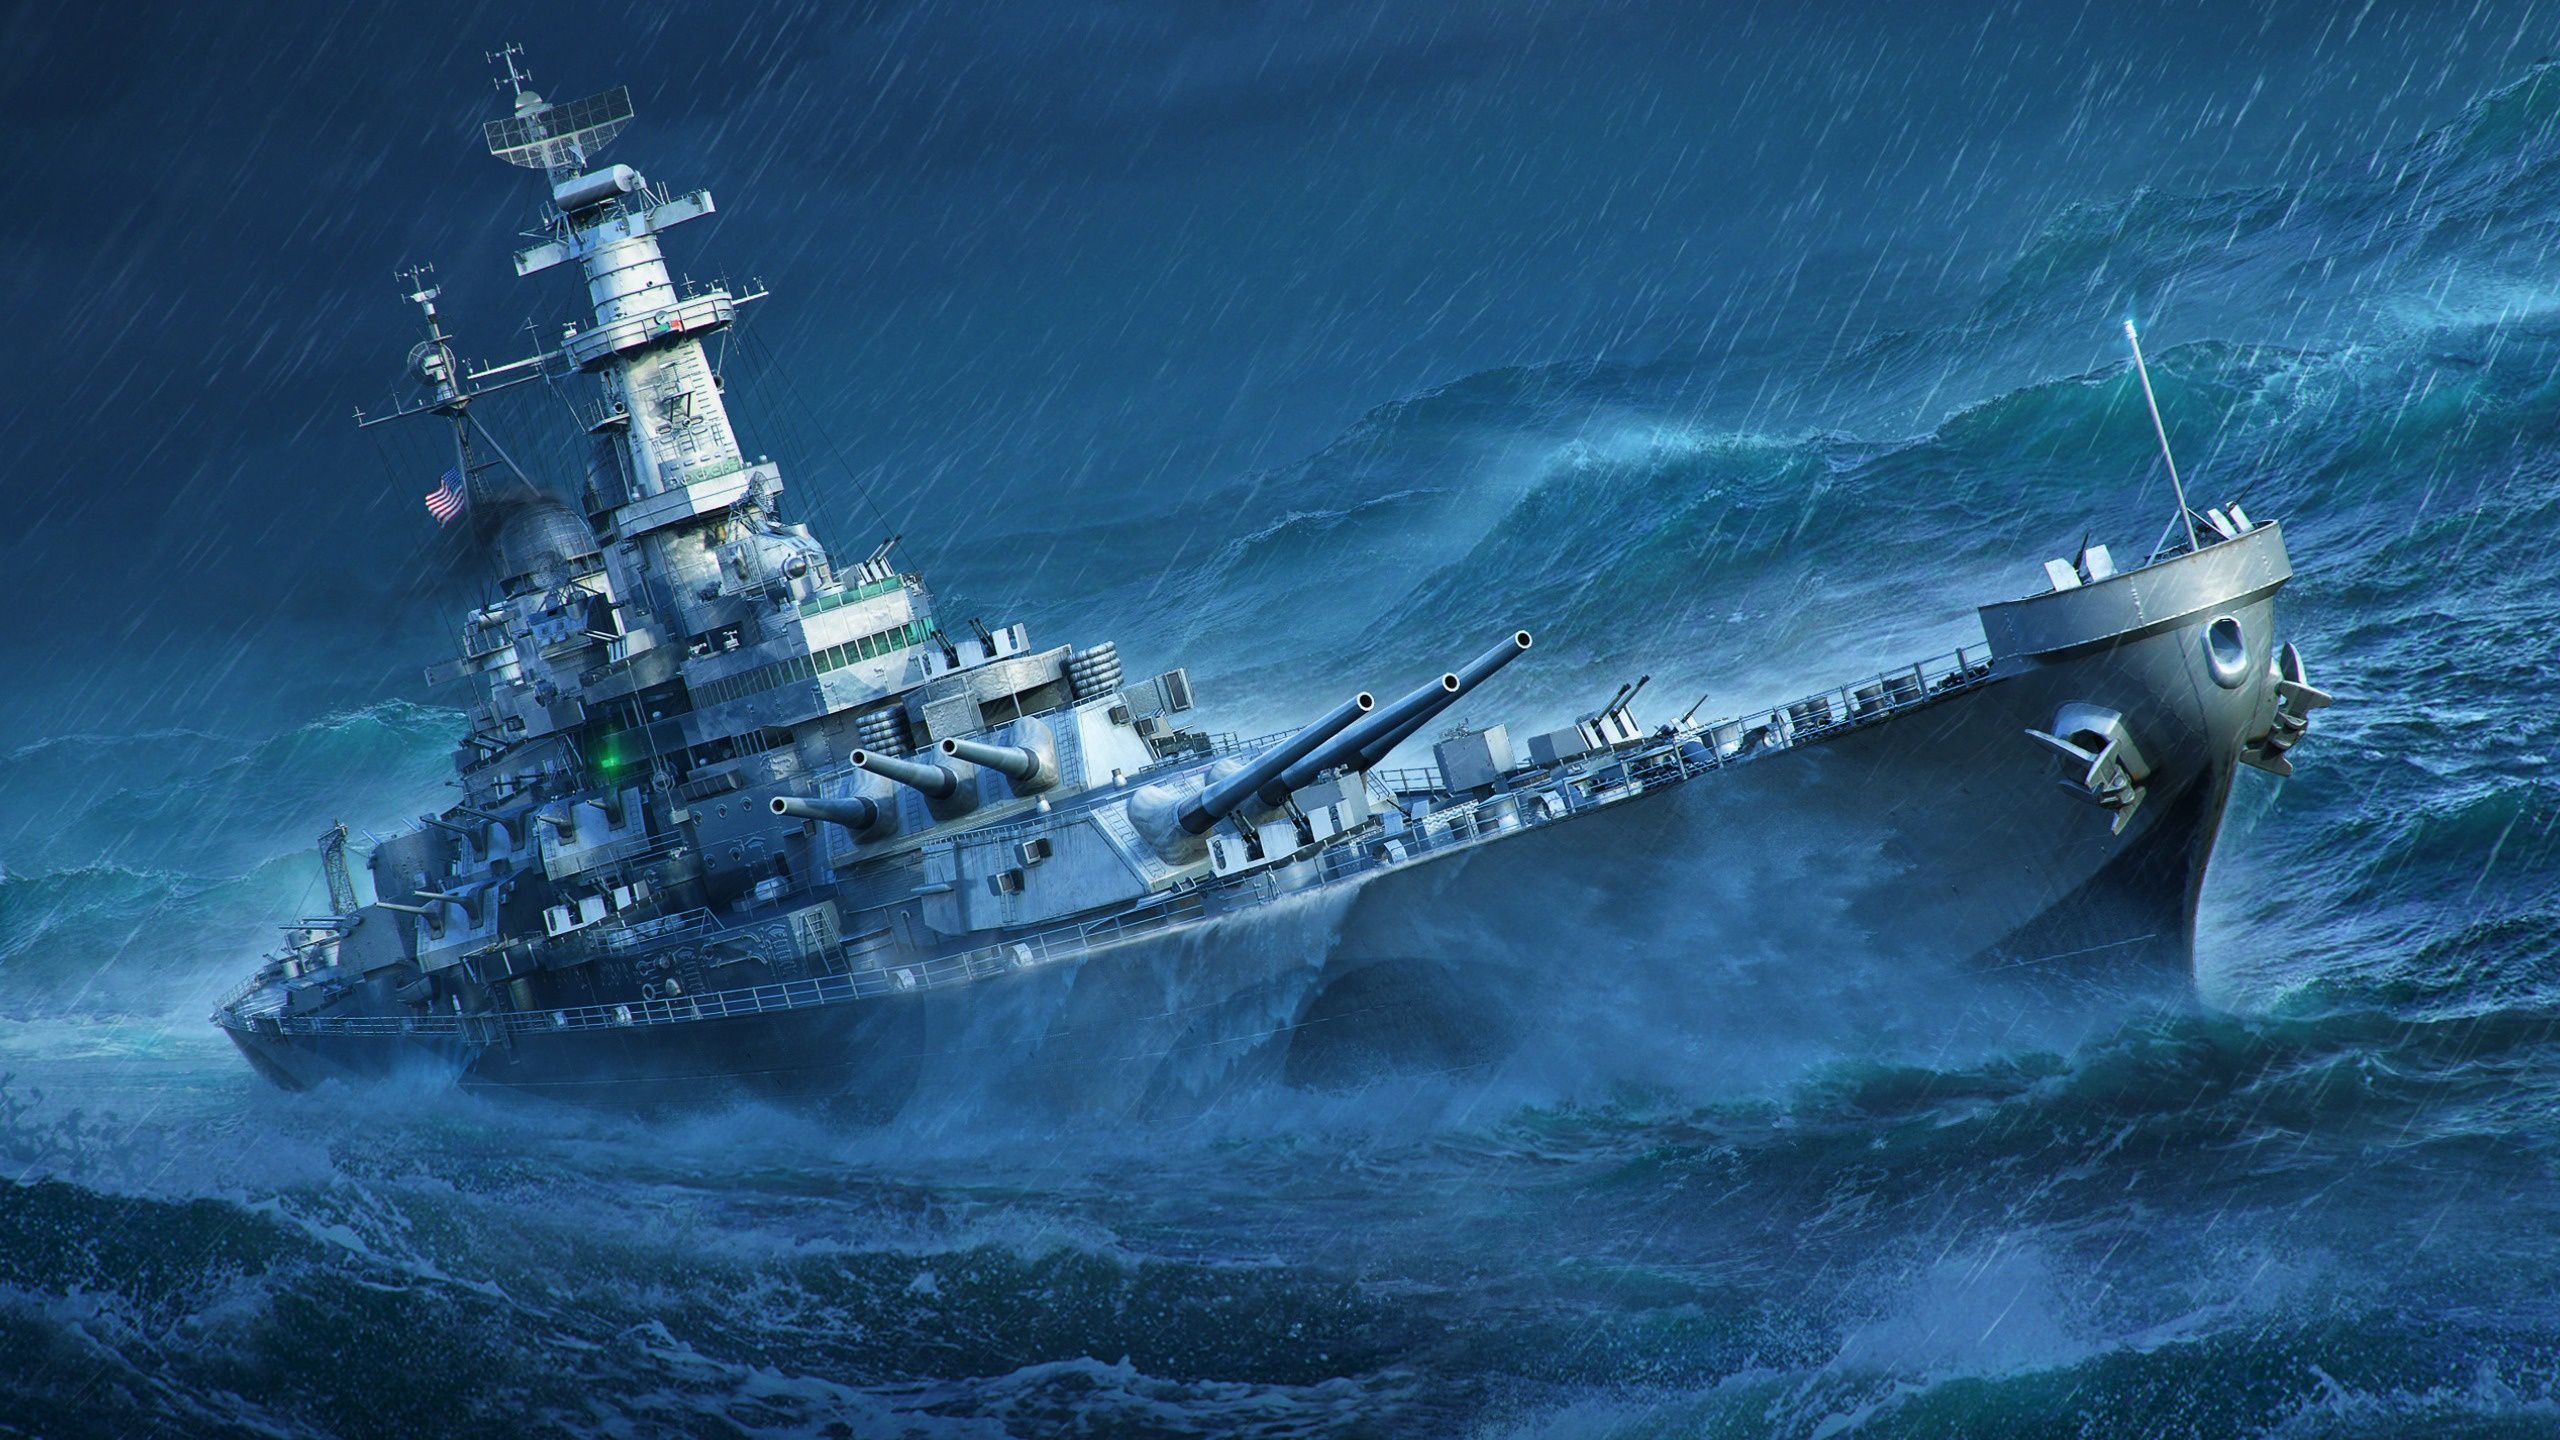 Video Game World Of Warships Warships Heart Wave Ship Sea Warship Heart Shaped Hd Wallpaper Background Image W World Of Warships Wallpaper Battleship Warship